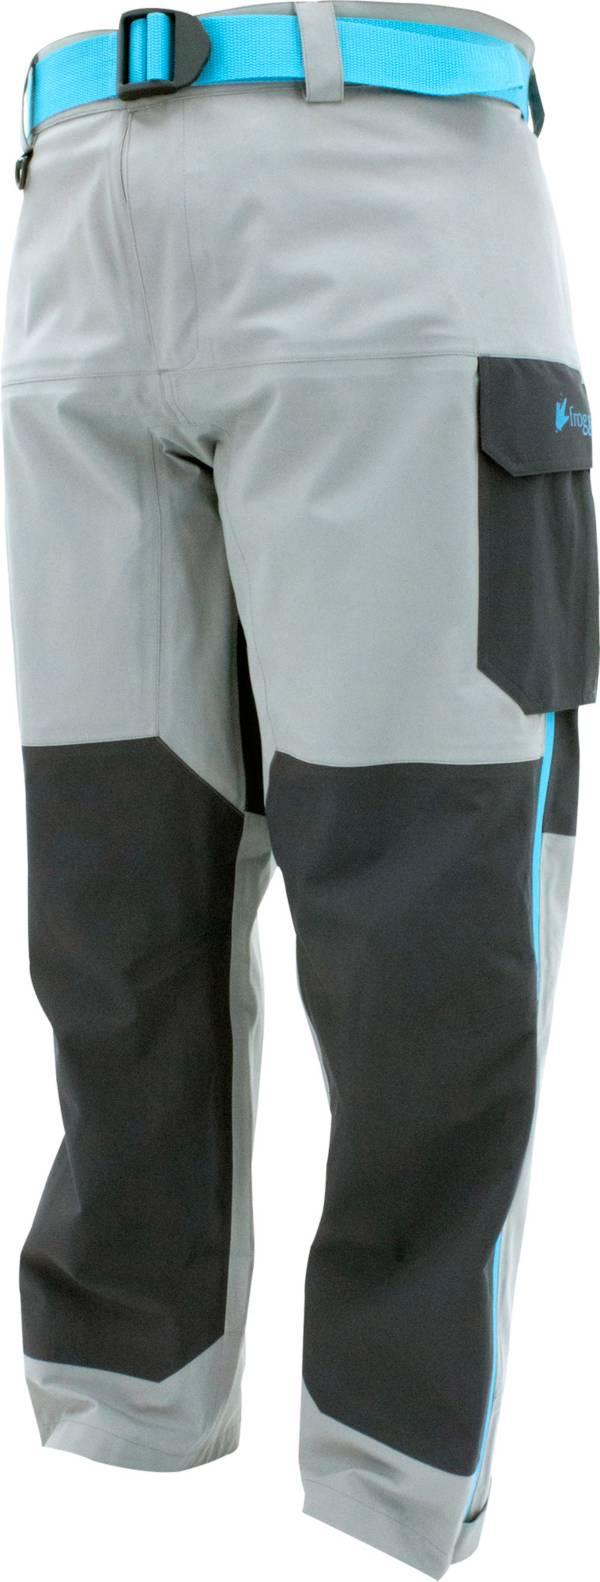 frogg toggs Women's Pilot Guide Fishing Pants product image